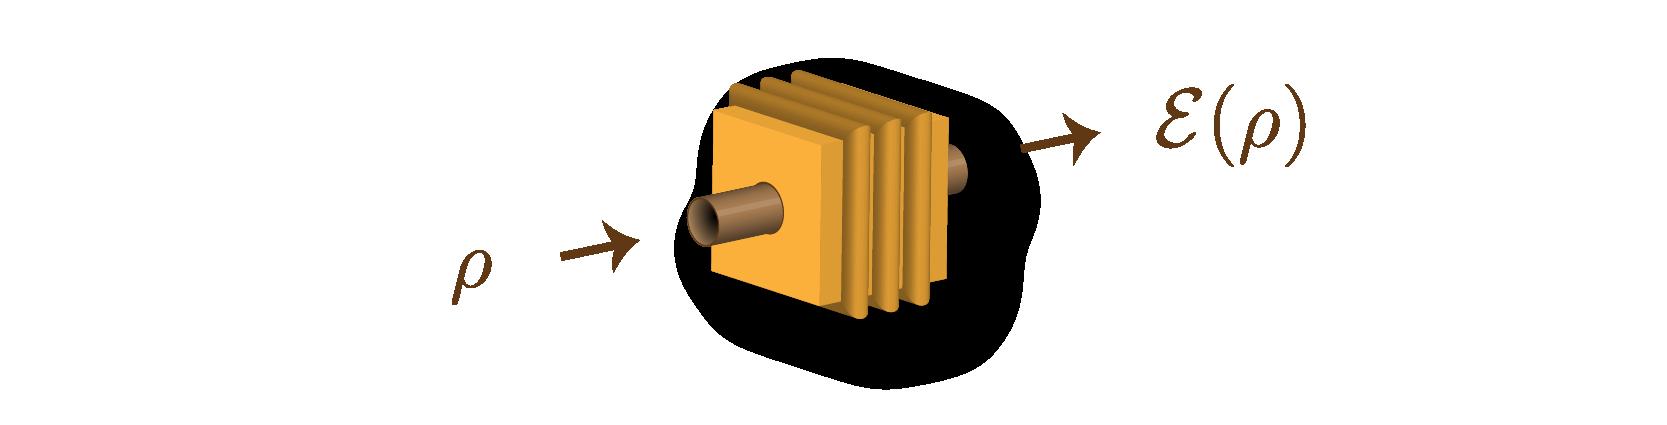 Thermodynamics of quantum channels